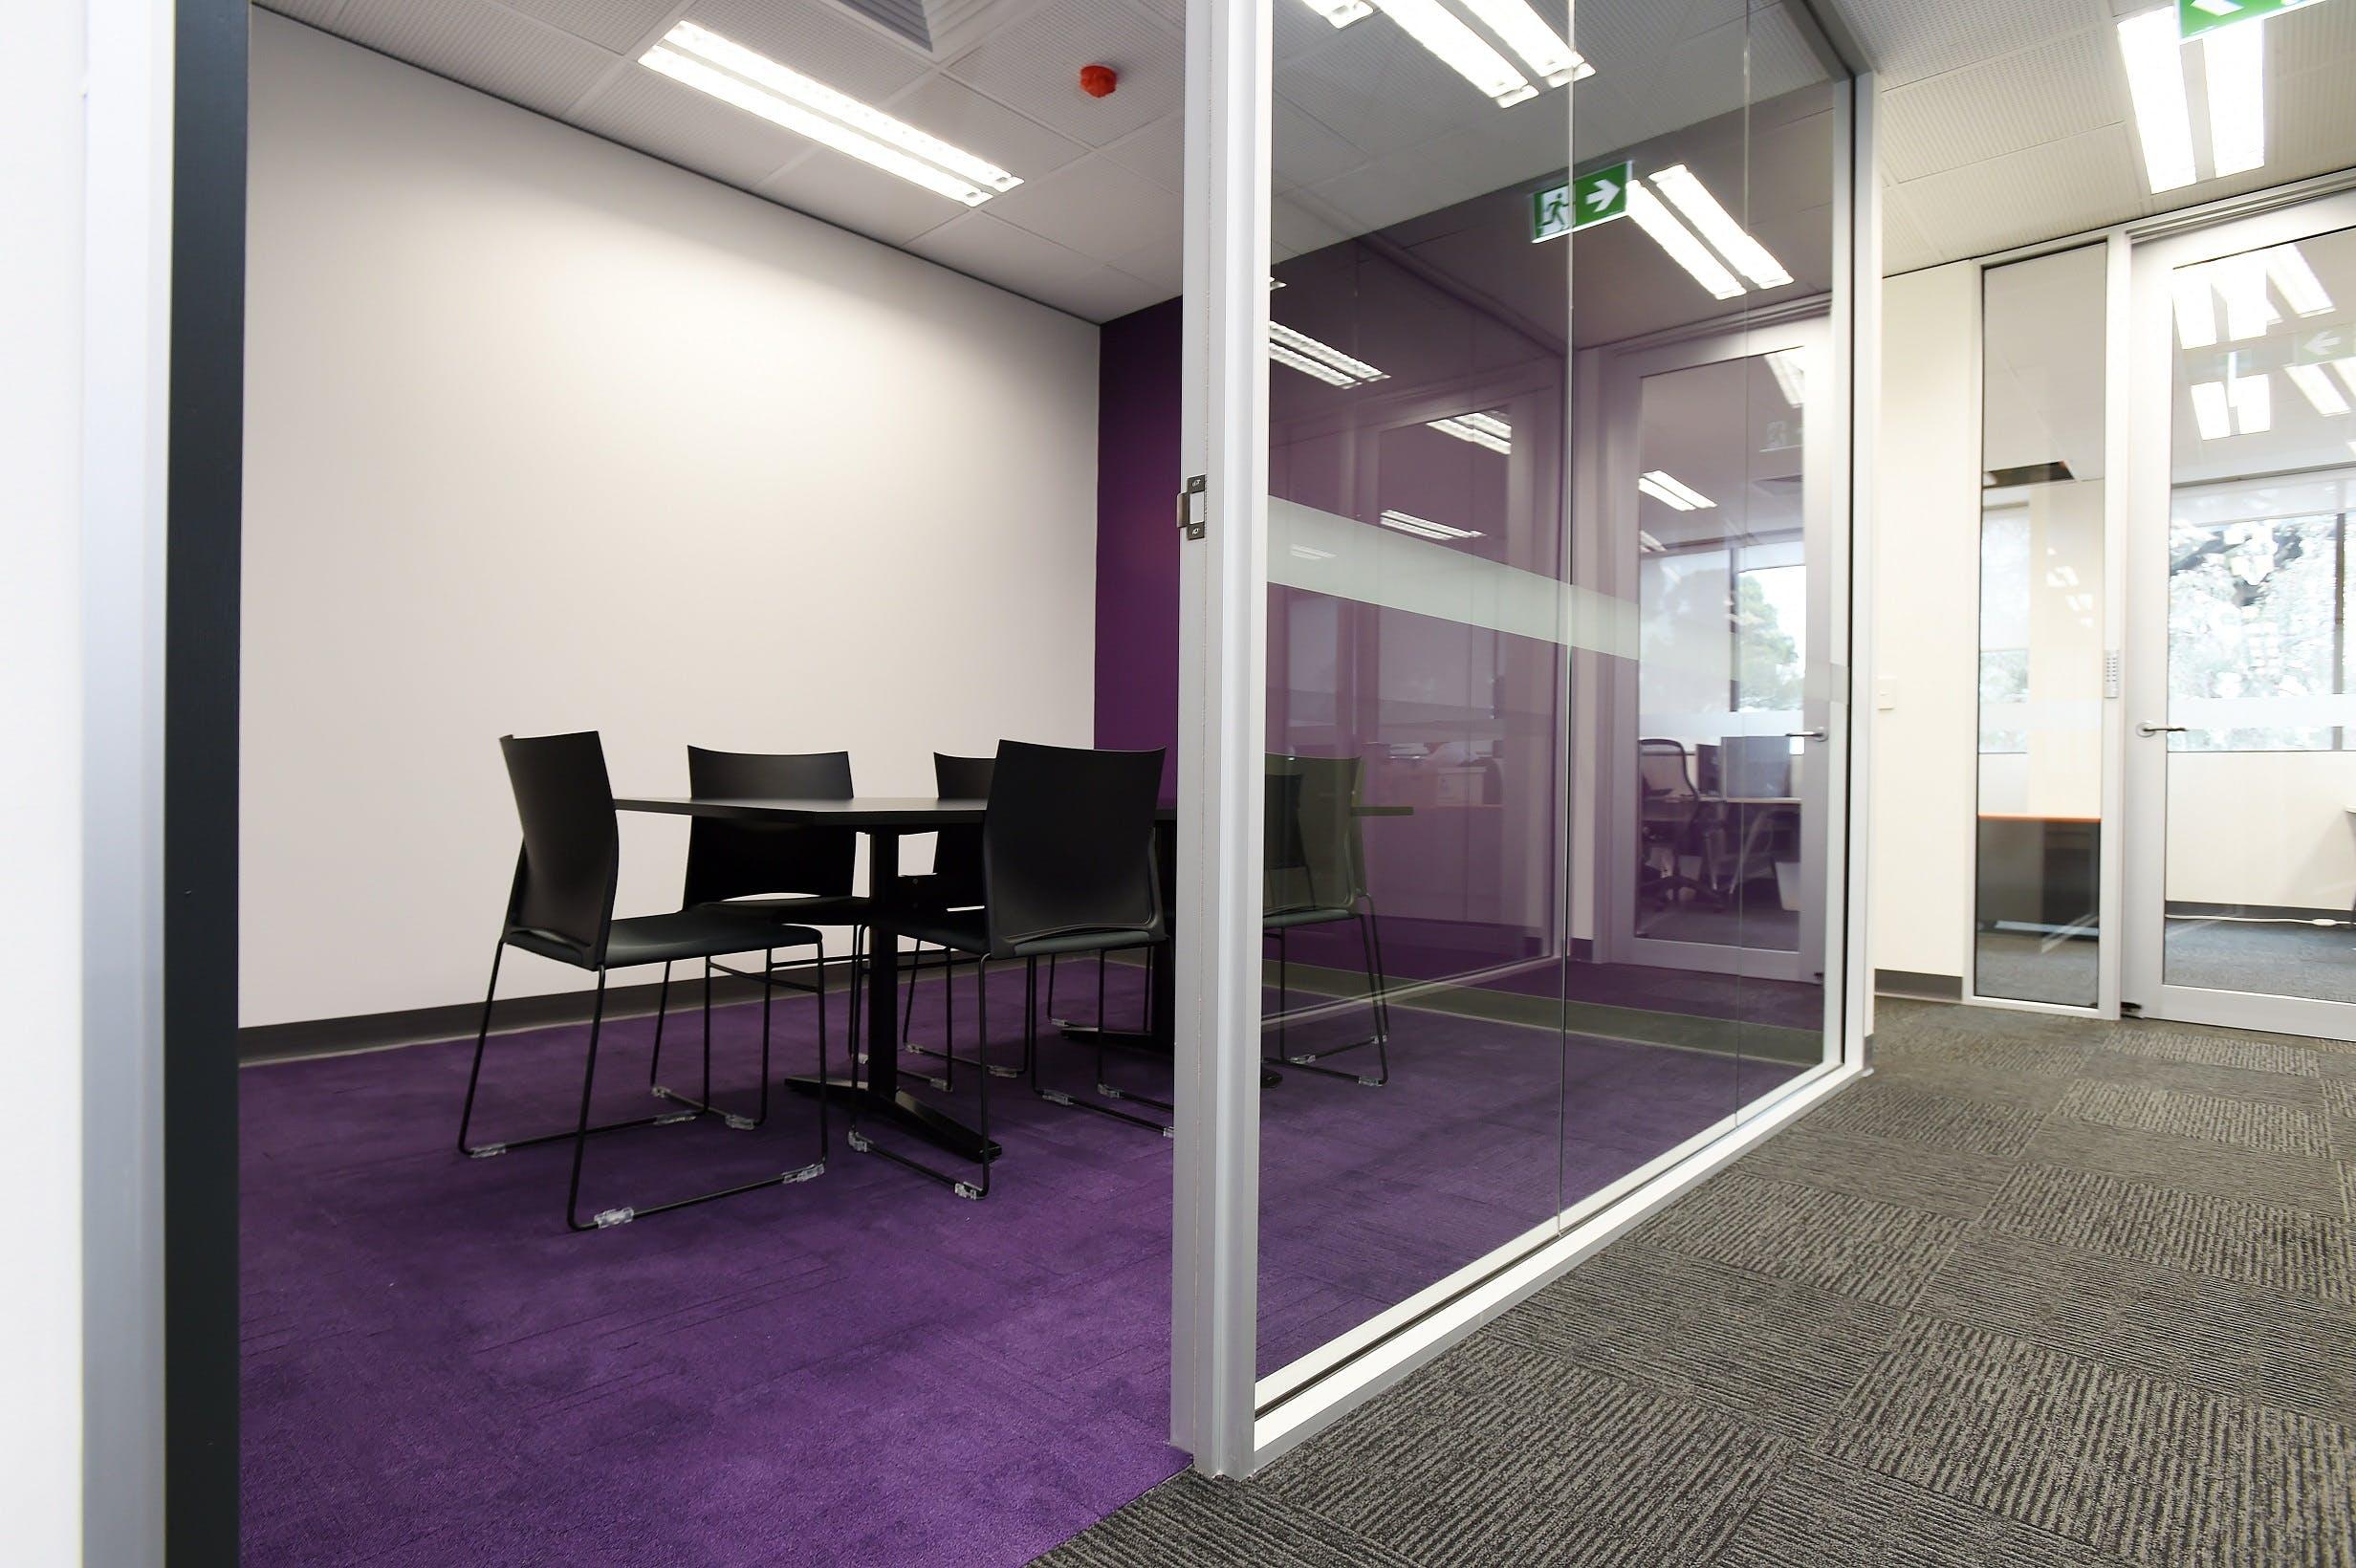 Meeting Room 5, meeting room at CO-HAB Tonsley, image 1